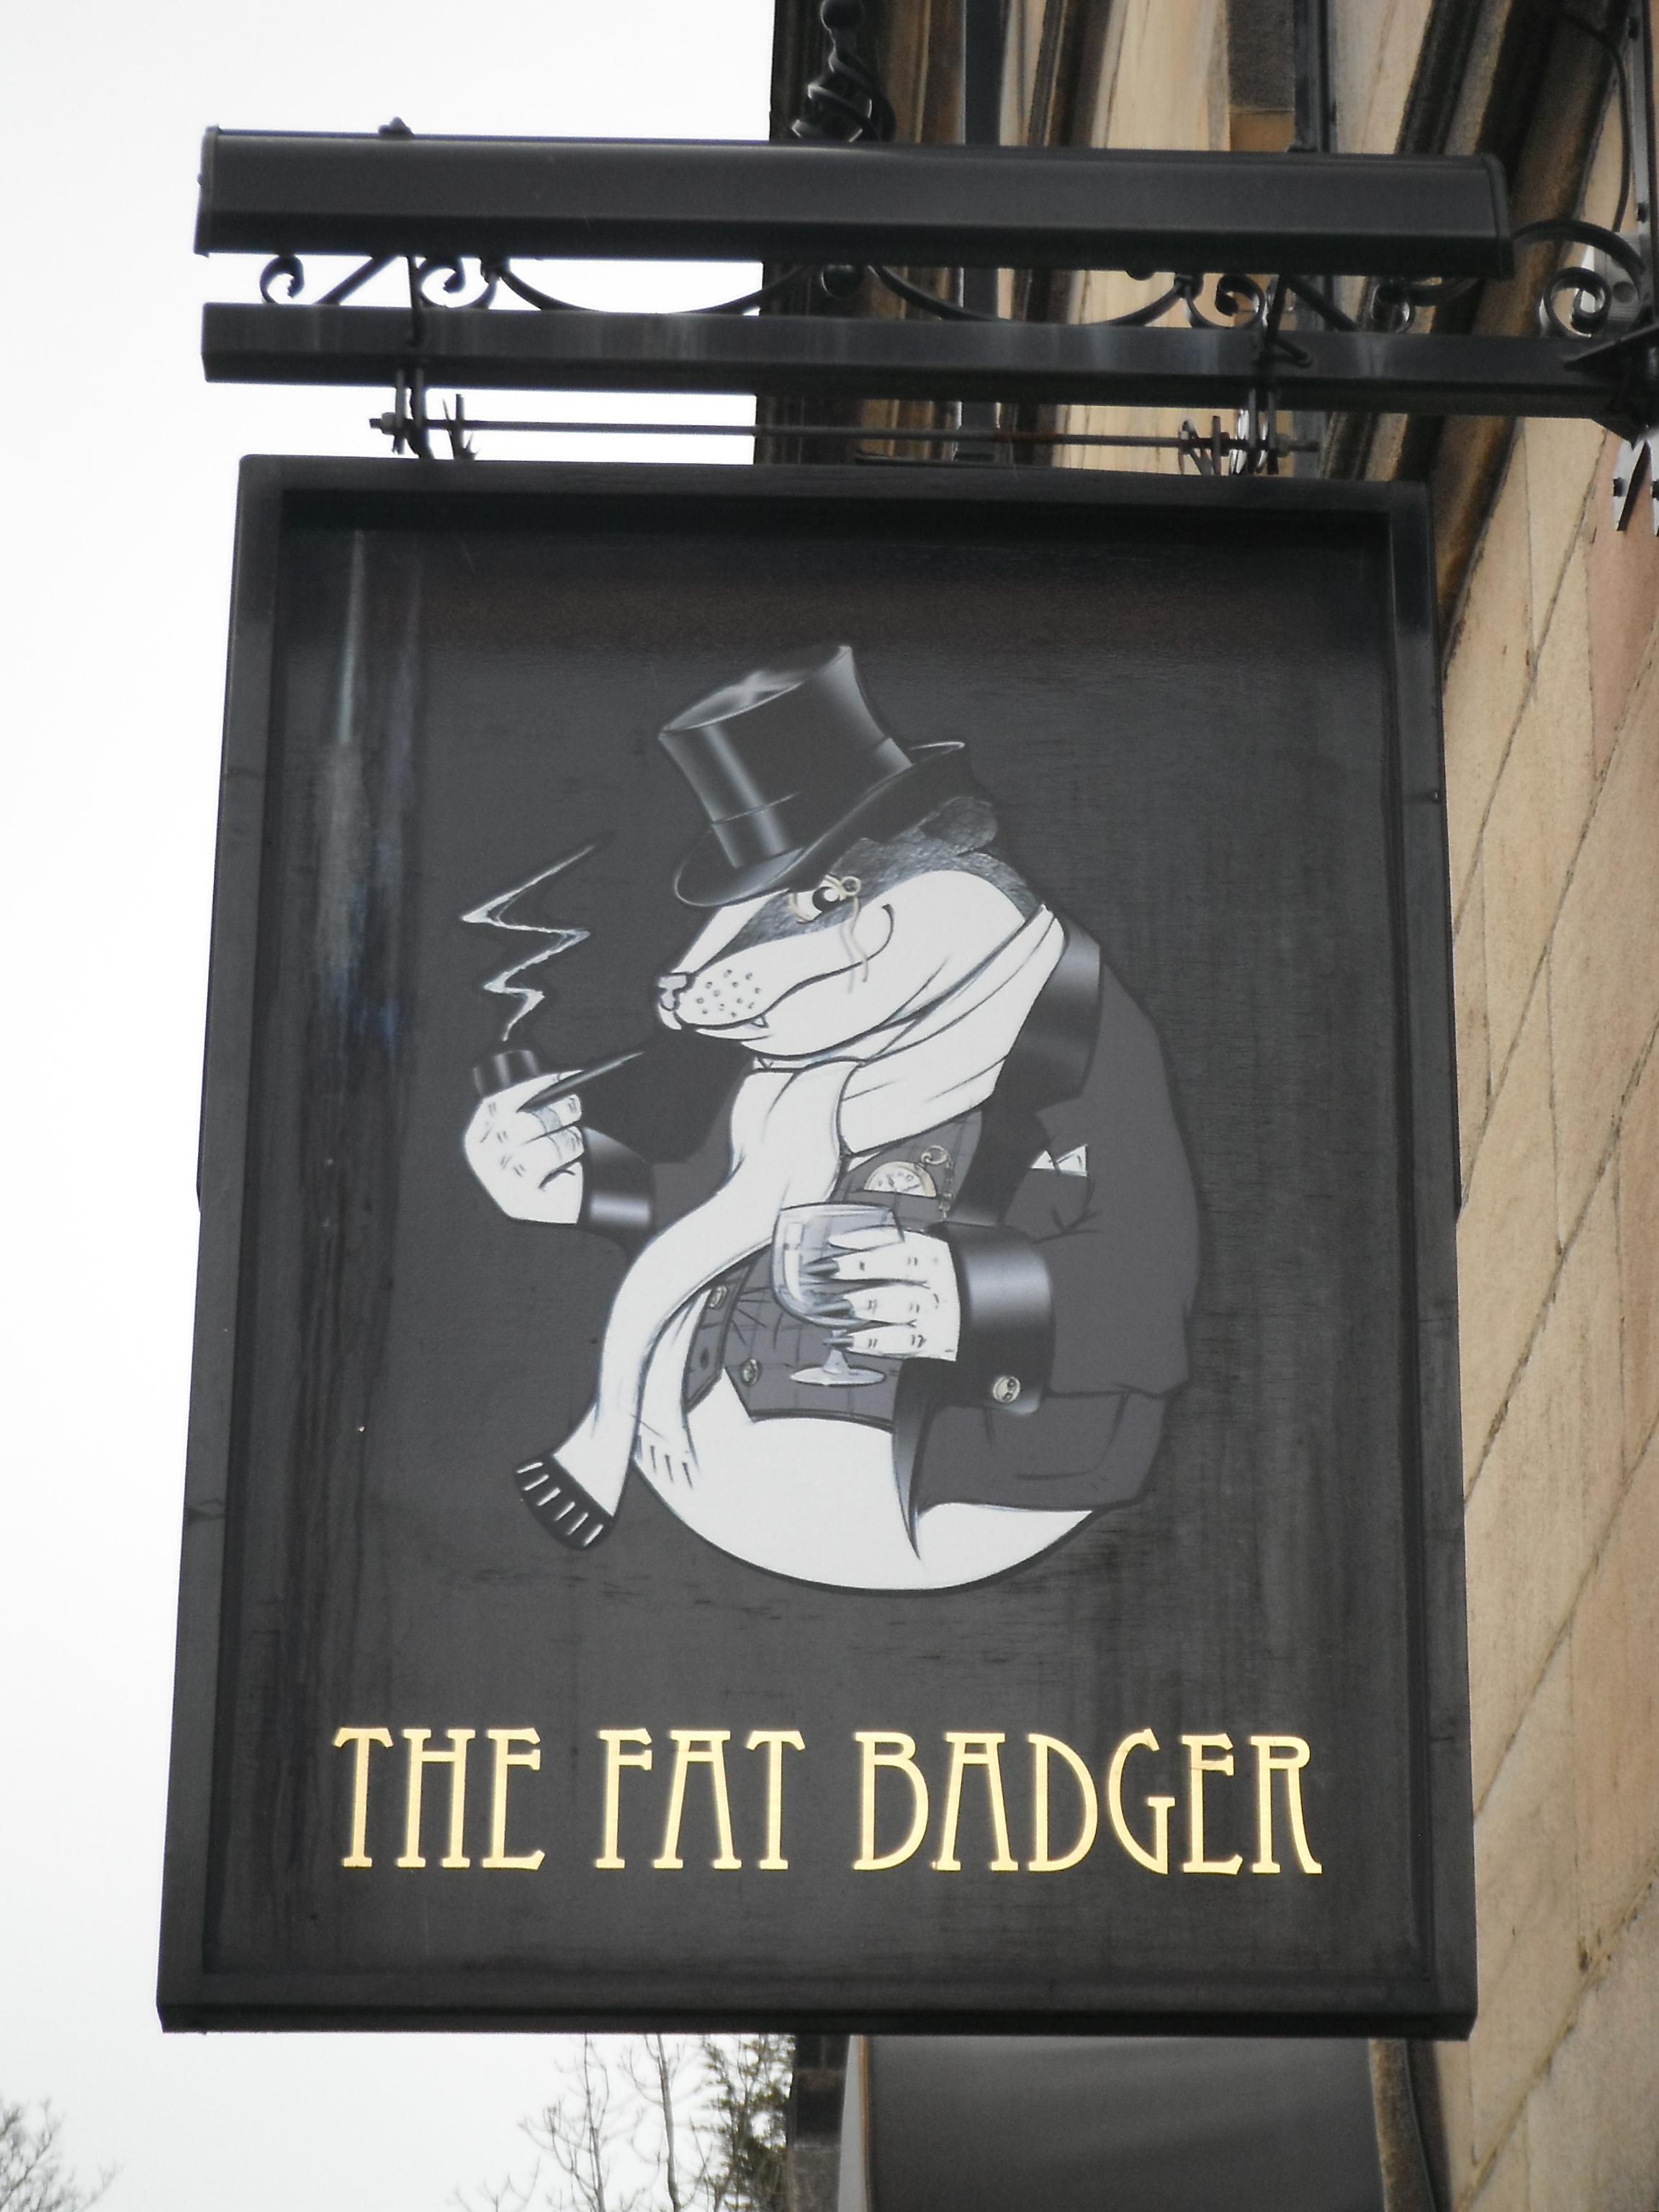 Photo taken by me – The Fat Badger Bar, Harrogate